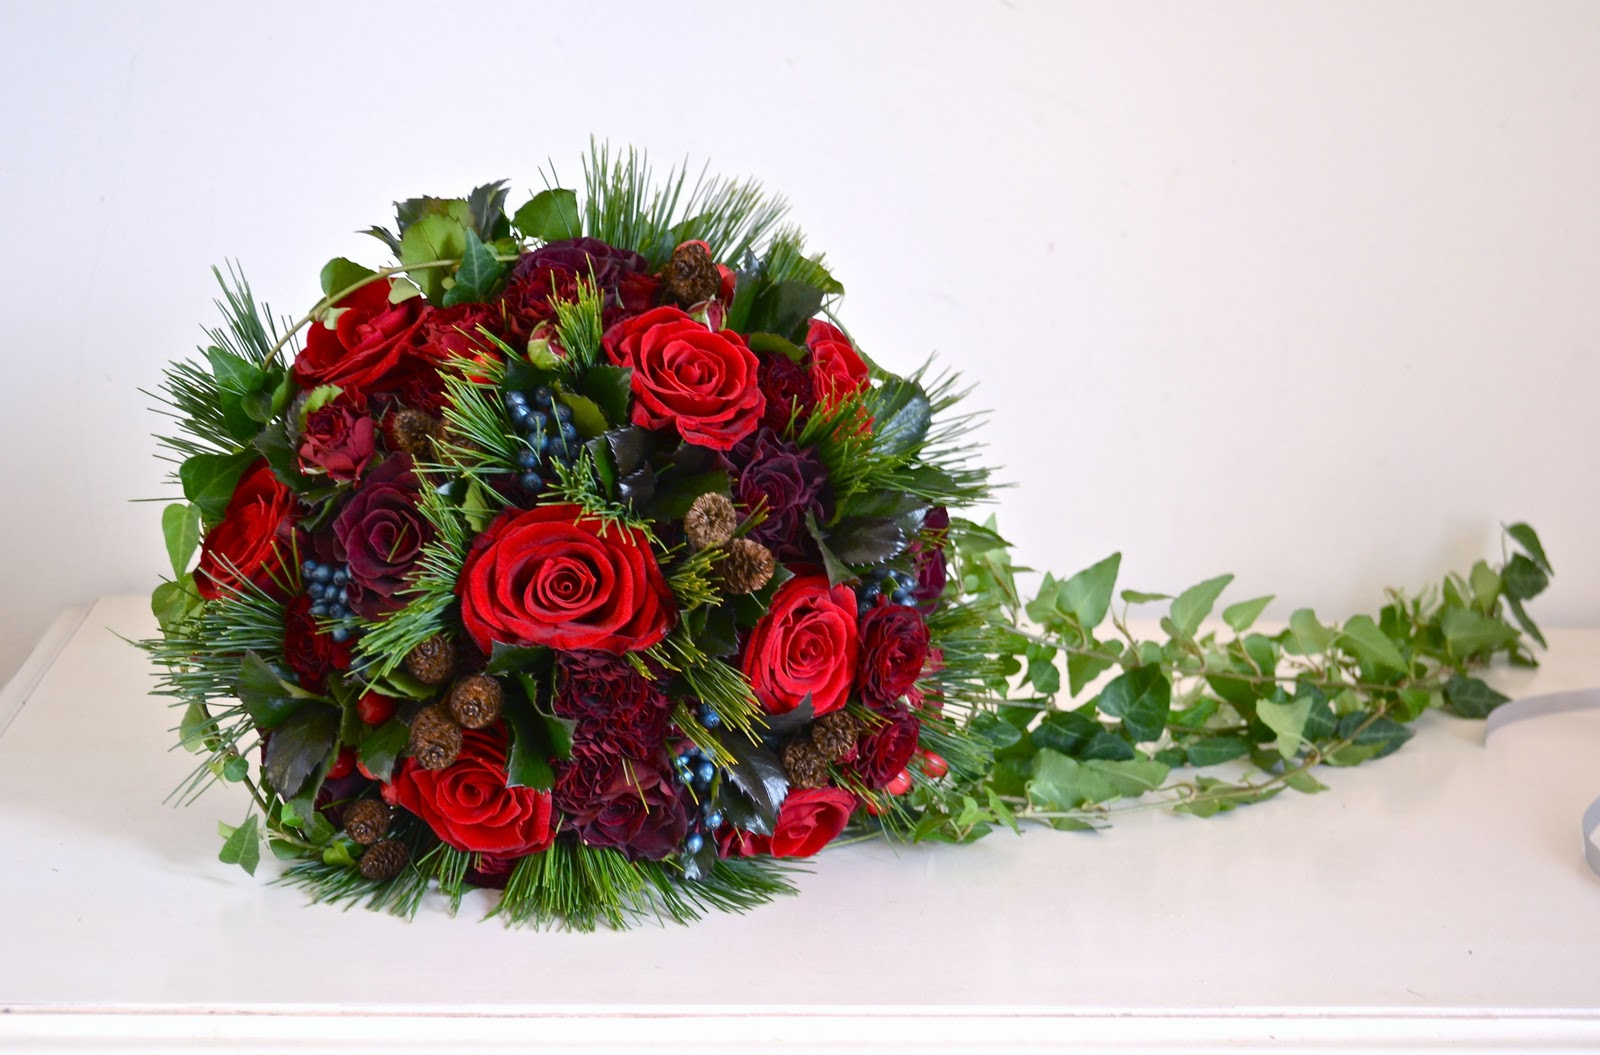 Wedding Flowers Blog: Jemma's Christmas Wedding Flowers ...